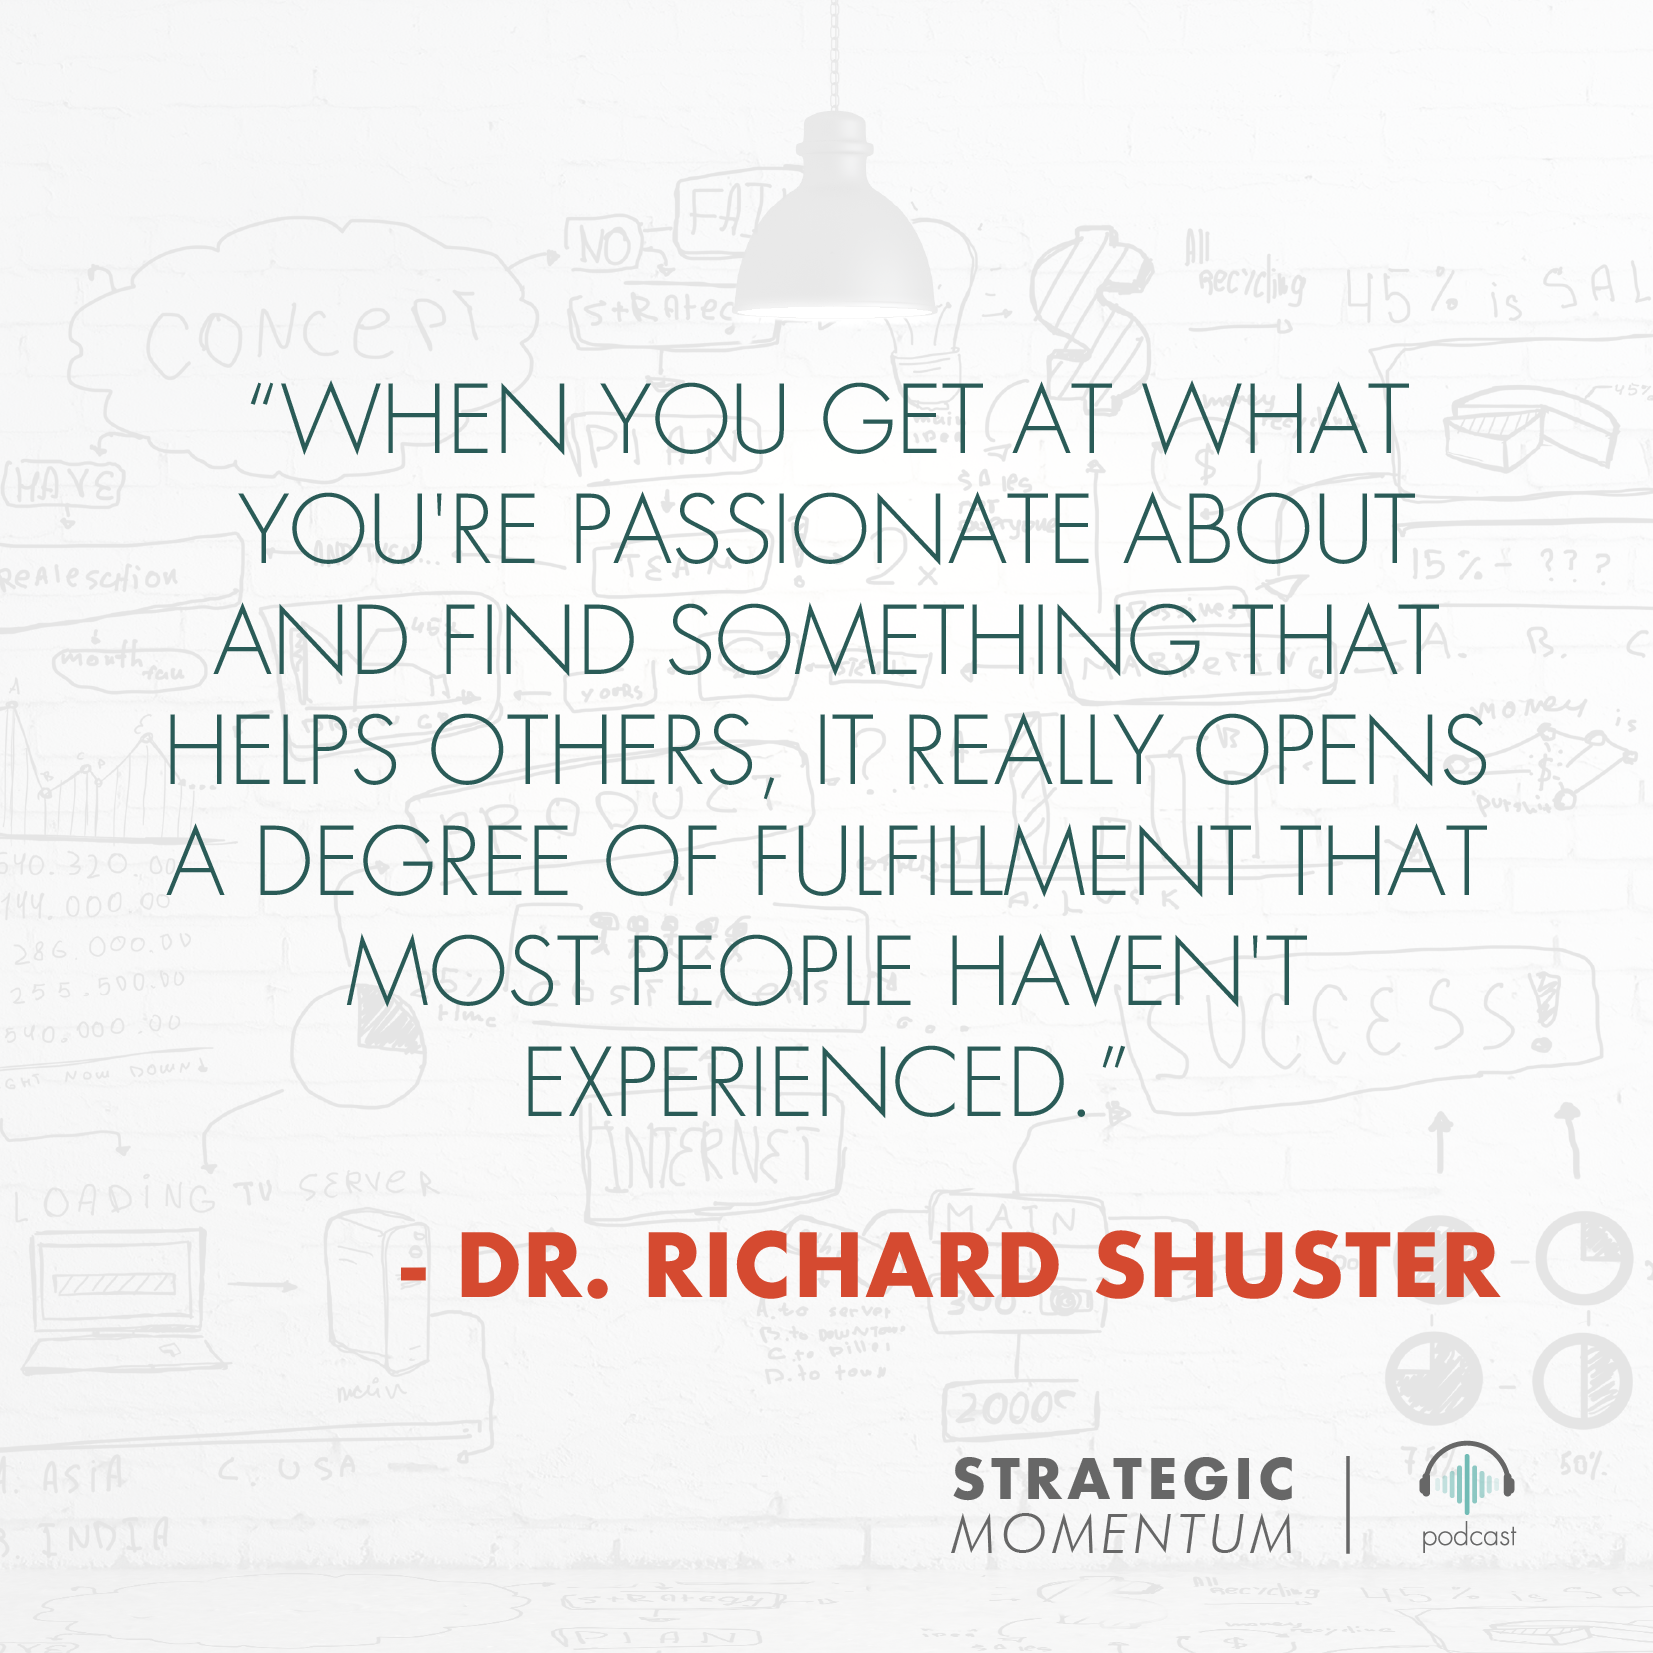 Dr. Richard Shuster Quote | Strategic Momentum Podcast